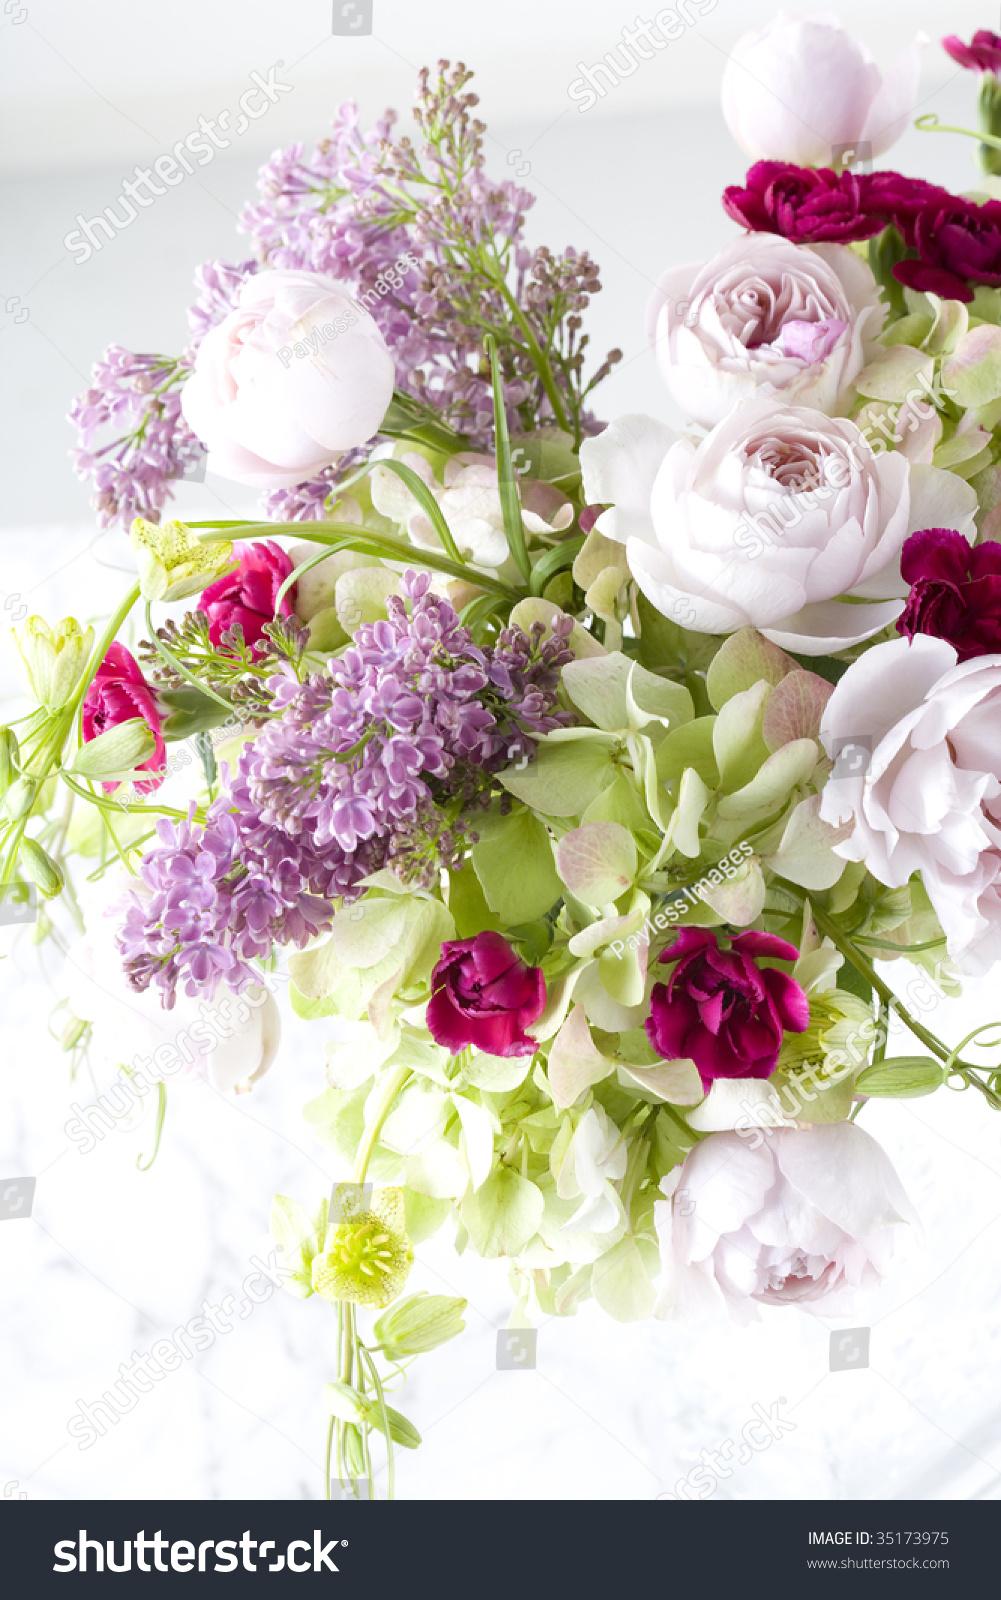 Beautiful Flower Arrangement Vase Stock Photo Edit Now 35173975